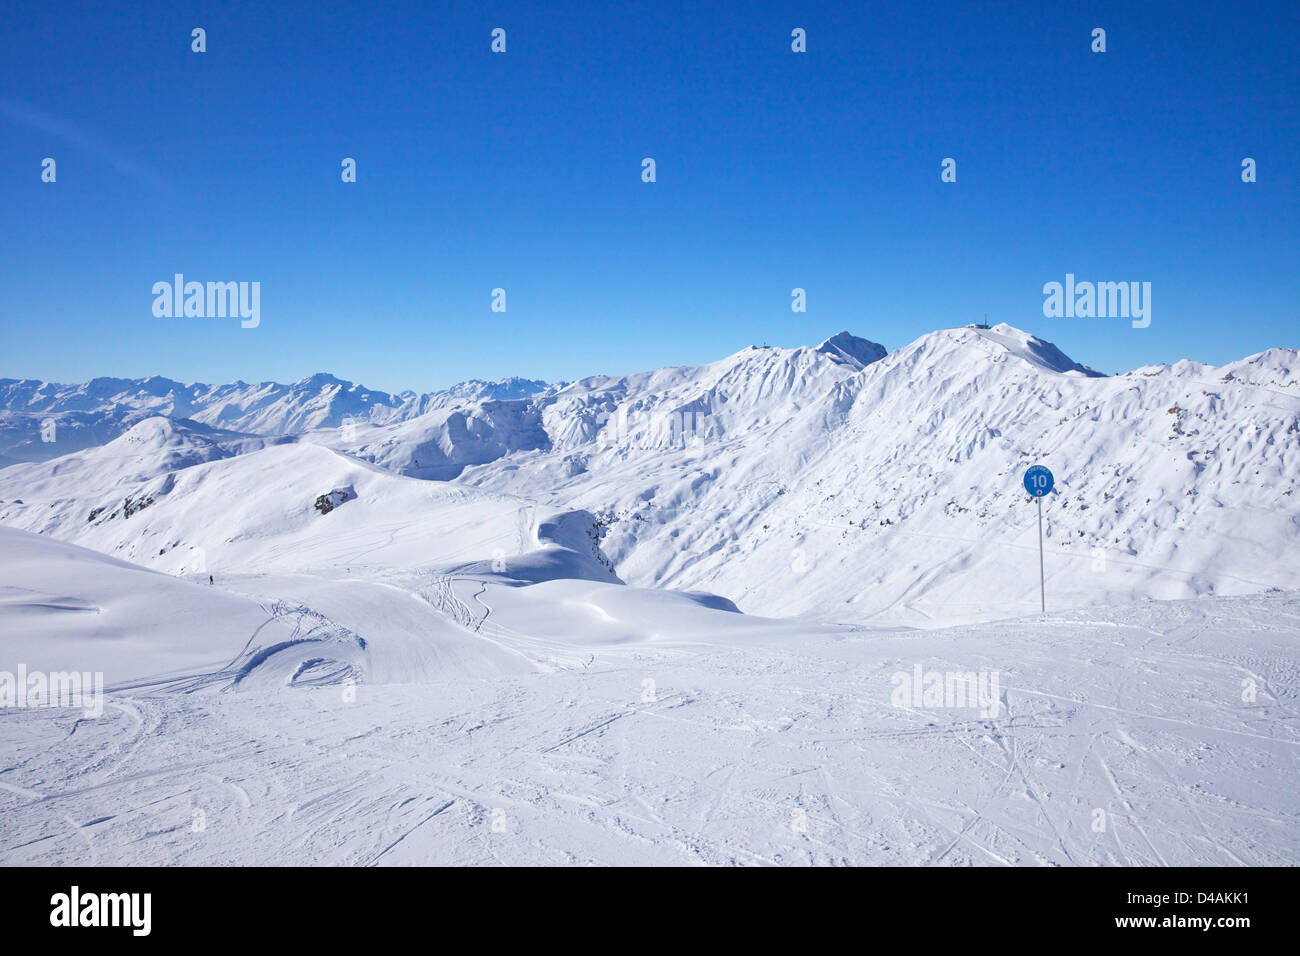 Les Crepines blue piste, winter sun, Champagny, La Plagne, France, Europe - Stock Image